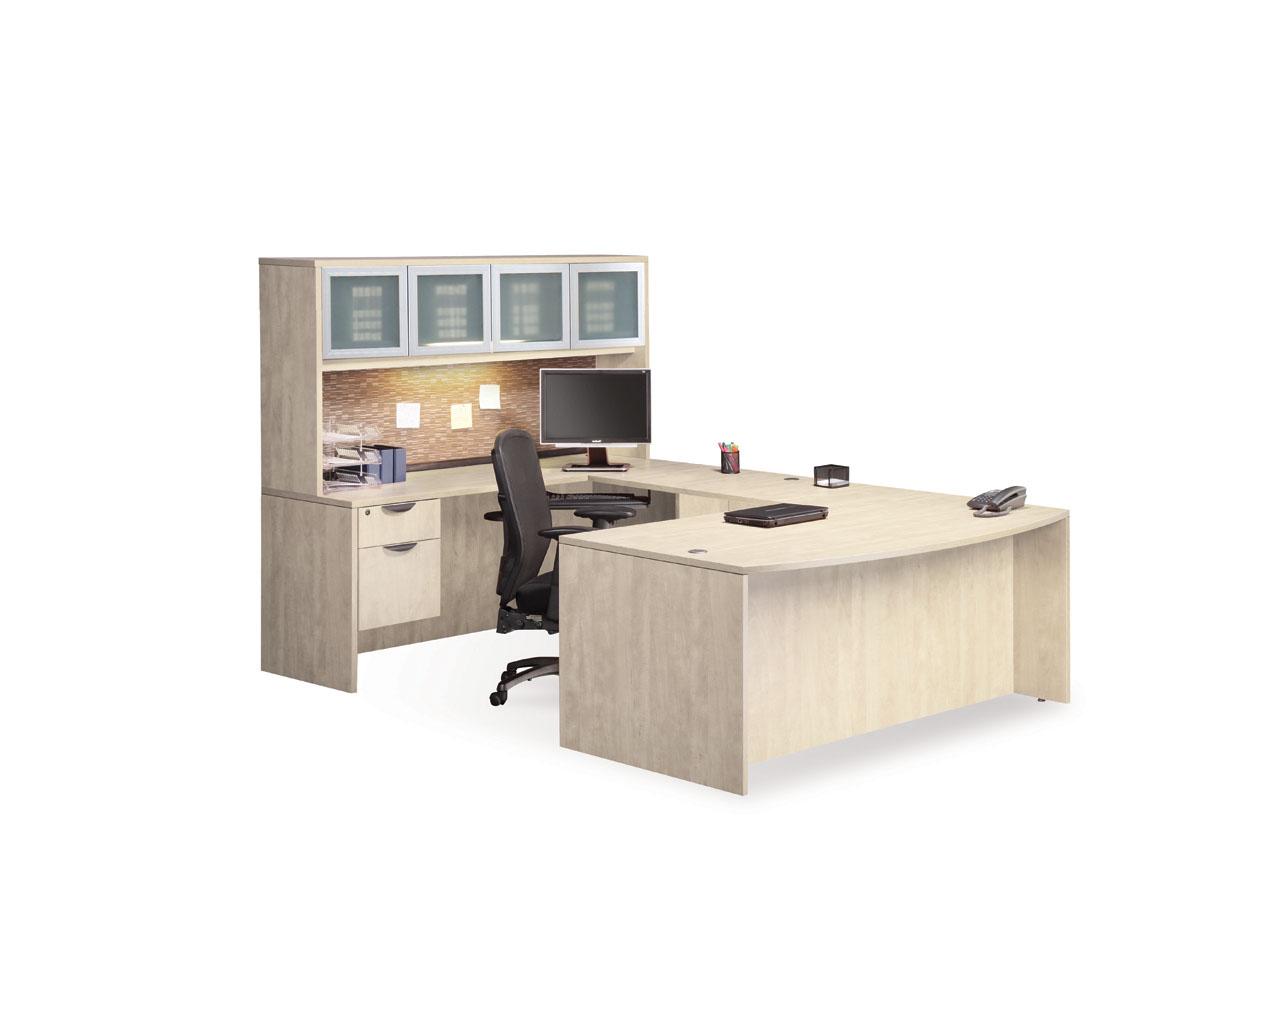 Executive Office Desk  Source Office Furniture  Office